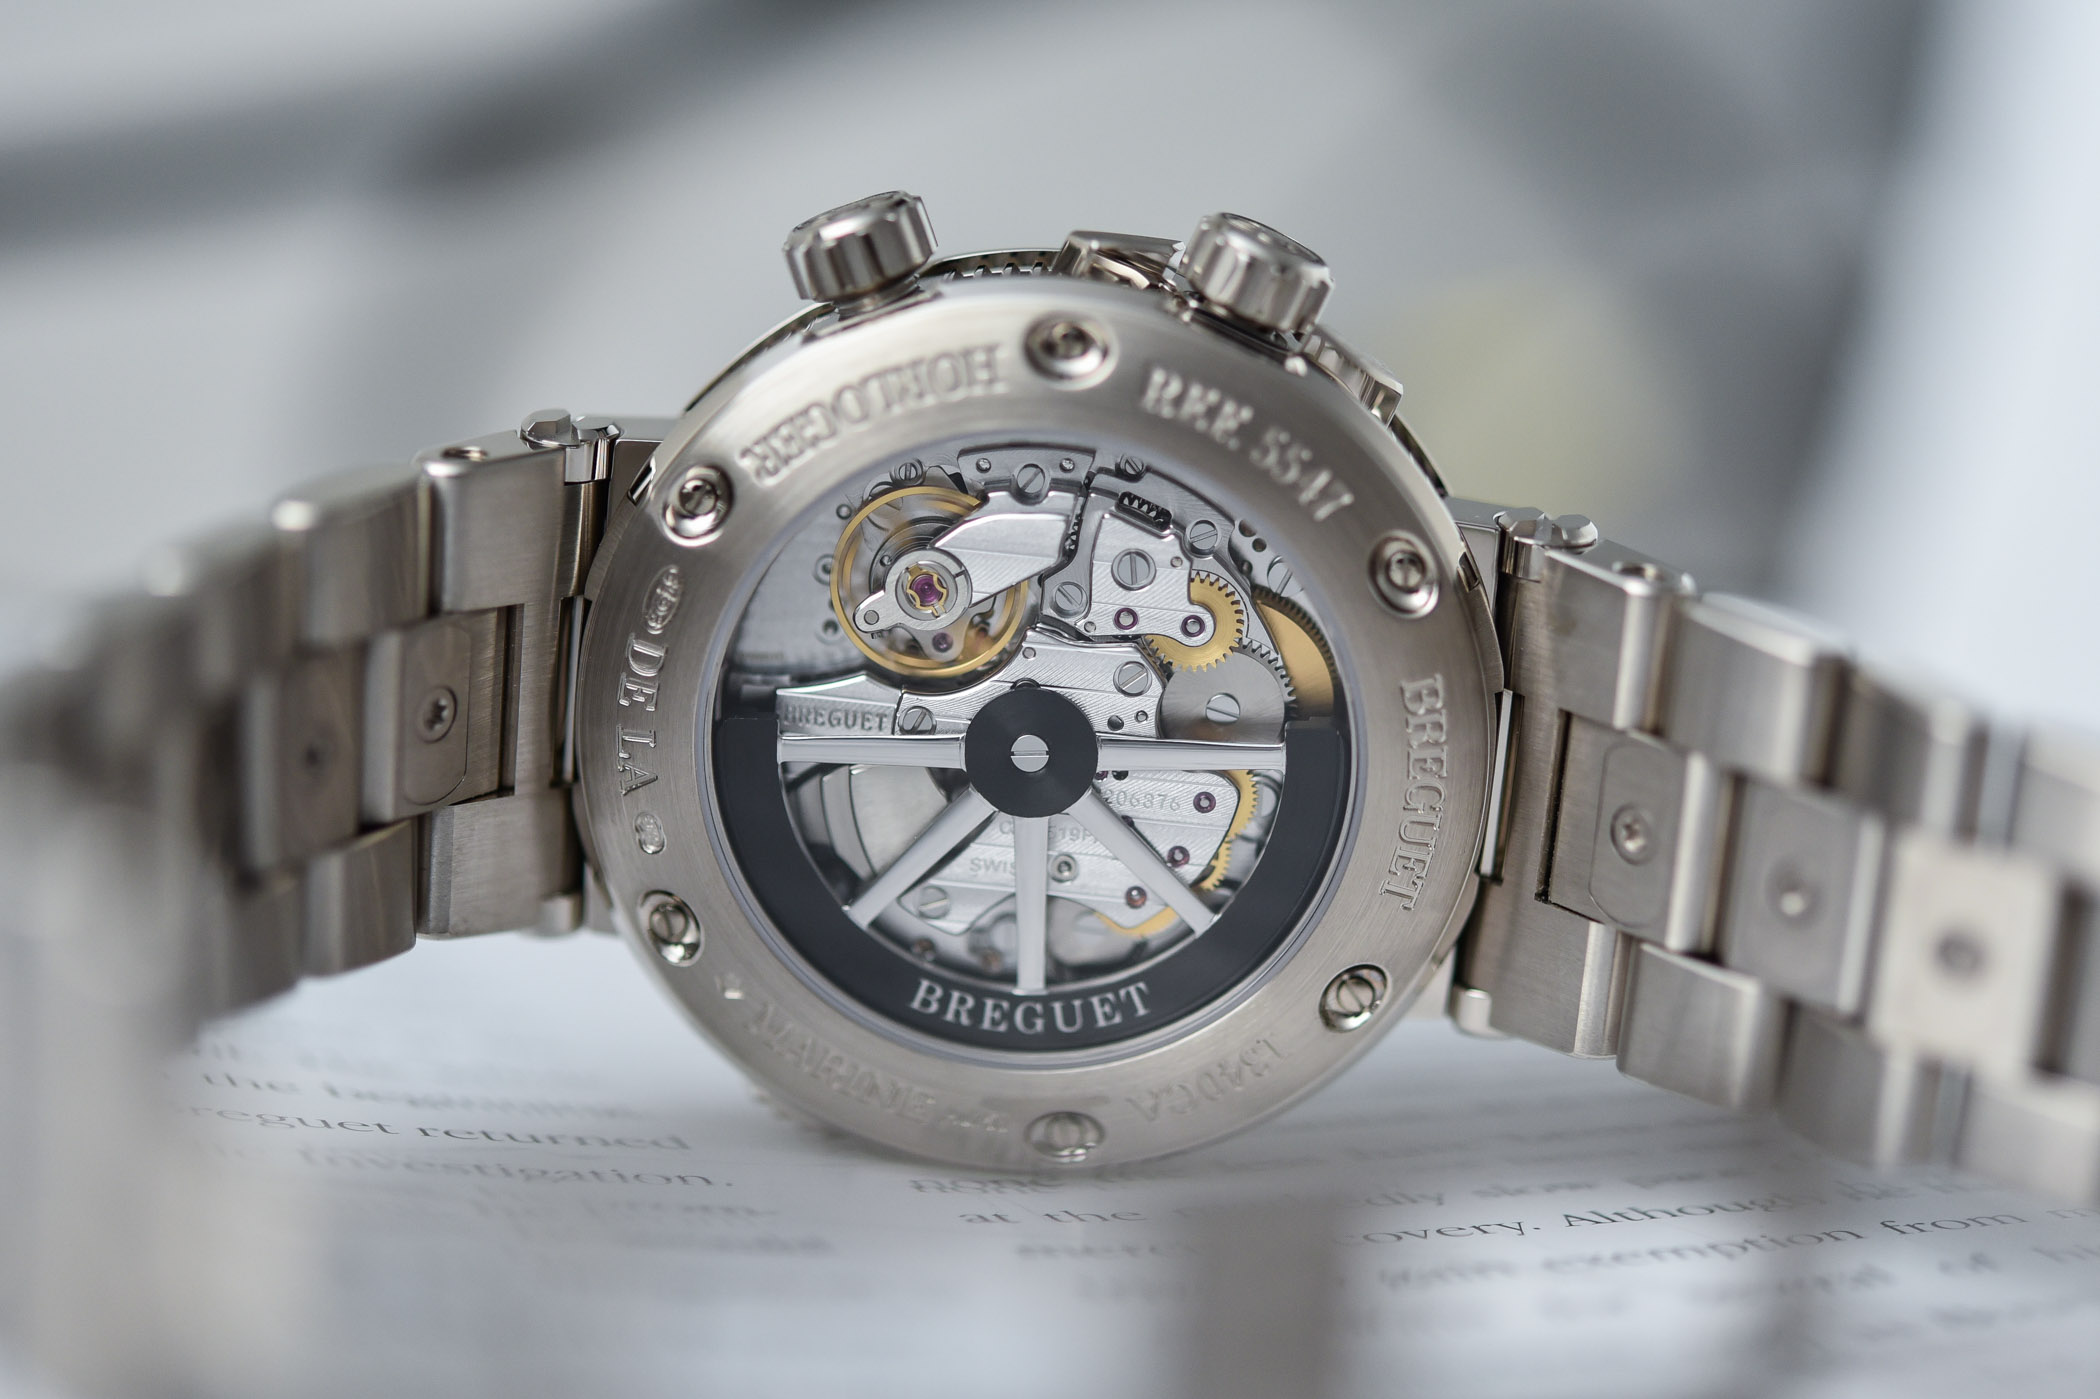 2020 Breguet Marine Alarme Musicale 5547 Gold Bracelet